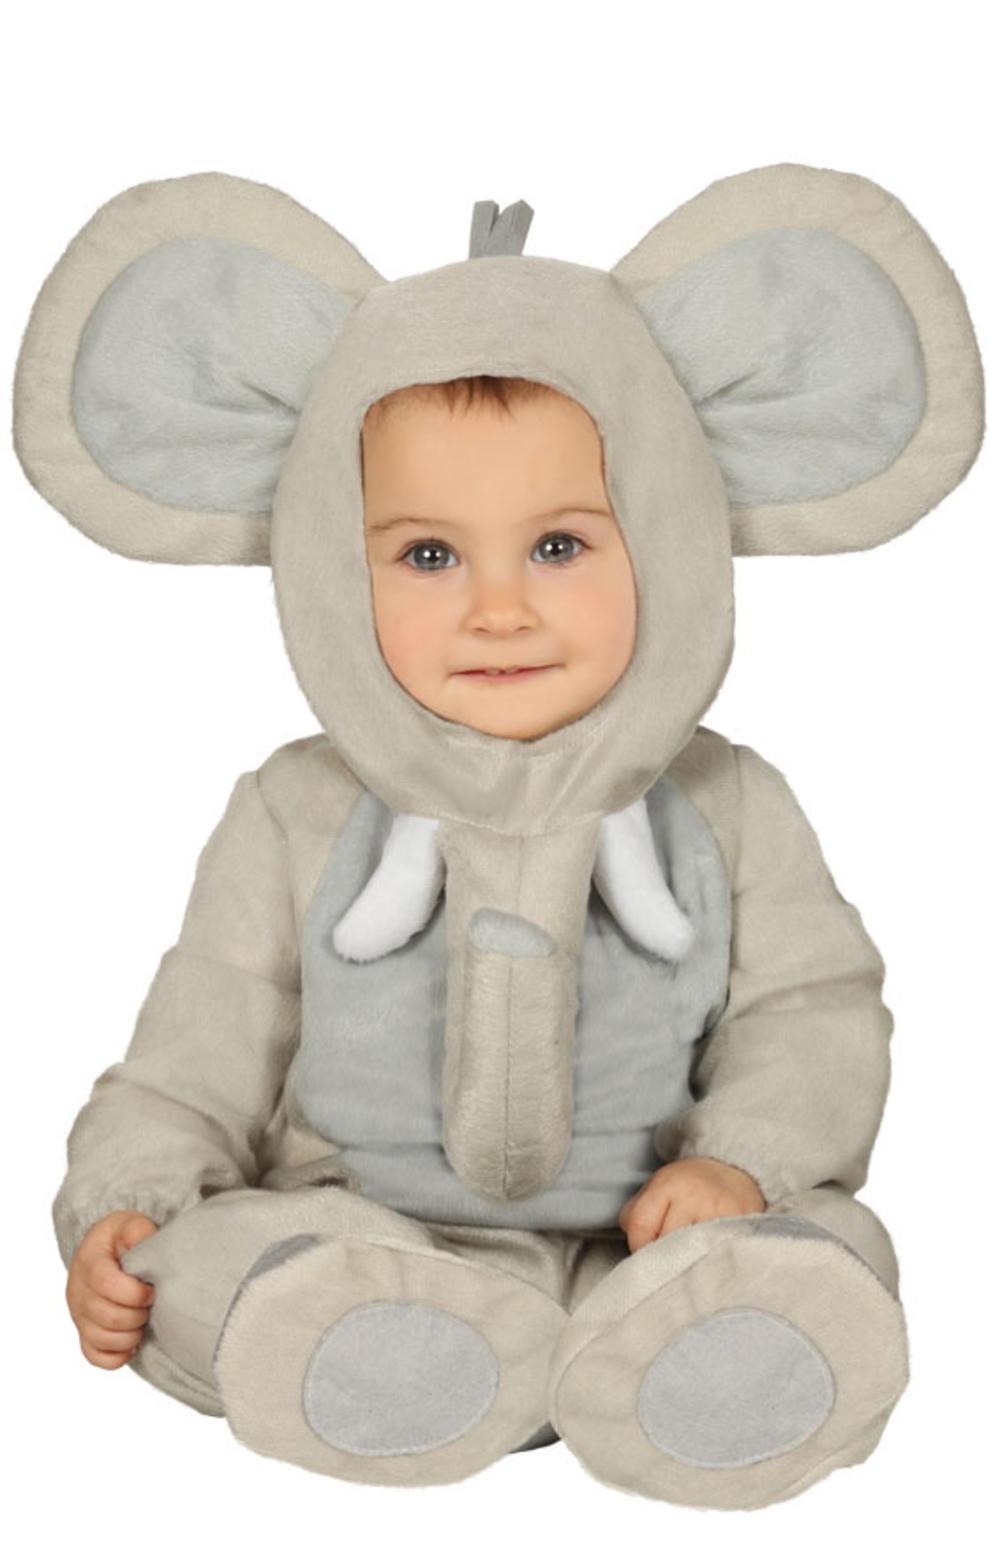 Baby Elephant Kids Costume Storybook Zoo Animal Cute Boys Girls Toddlers Costume